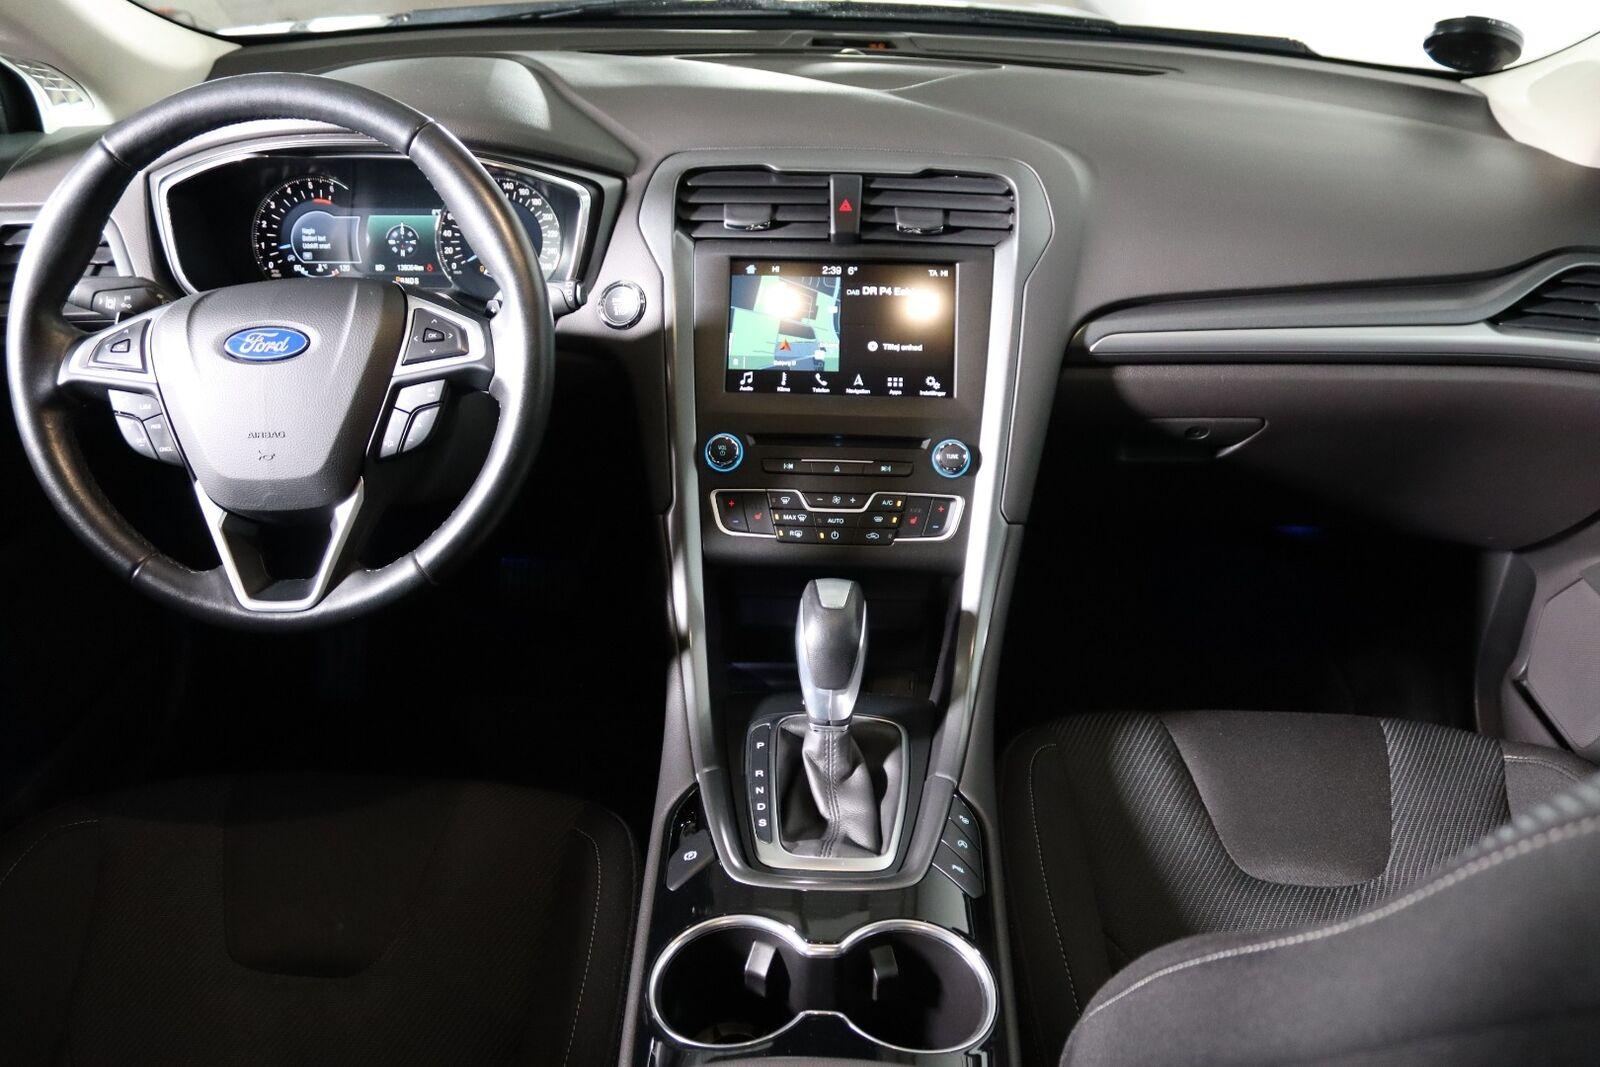 Ford Mondeo 2,0 TDCi 180 Titanium aut. - billede 8